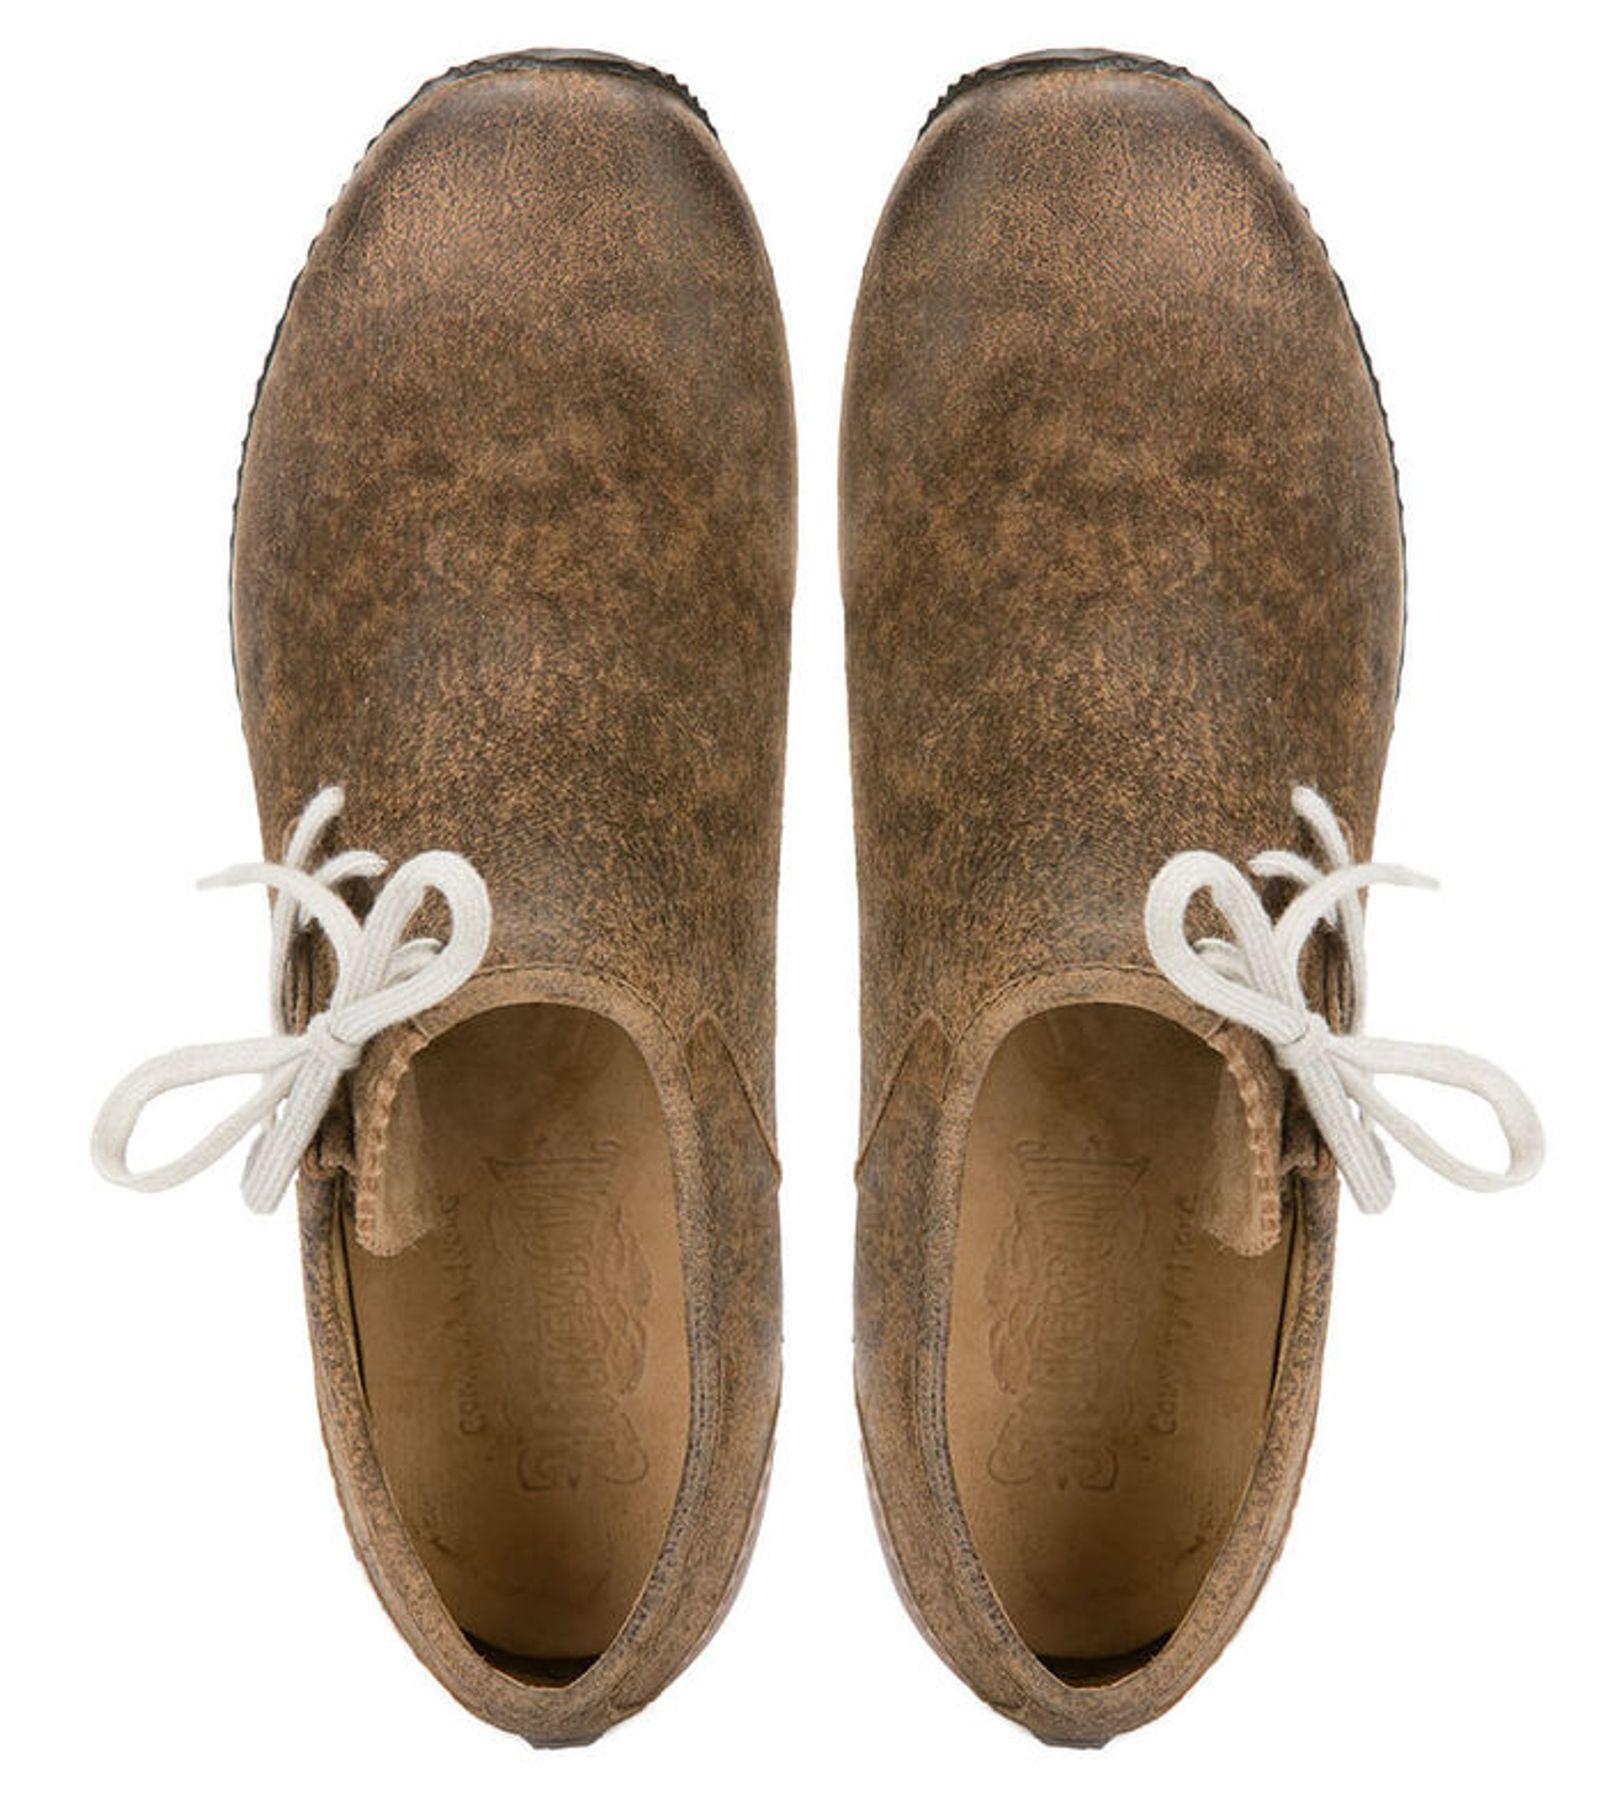 Stockerpoint- Herren Trachten Schuhe in Havanna, 1340 – Bild 4